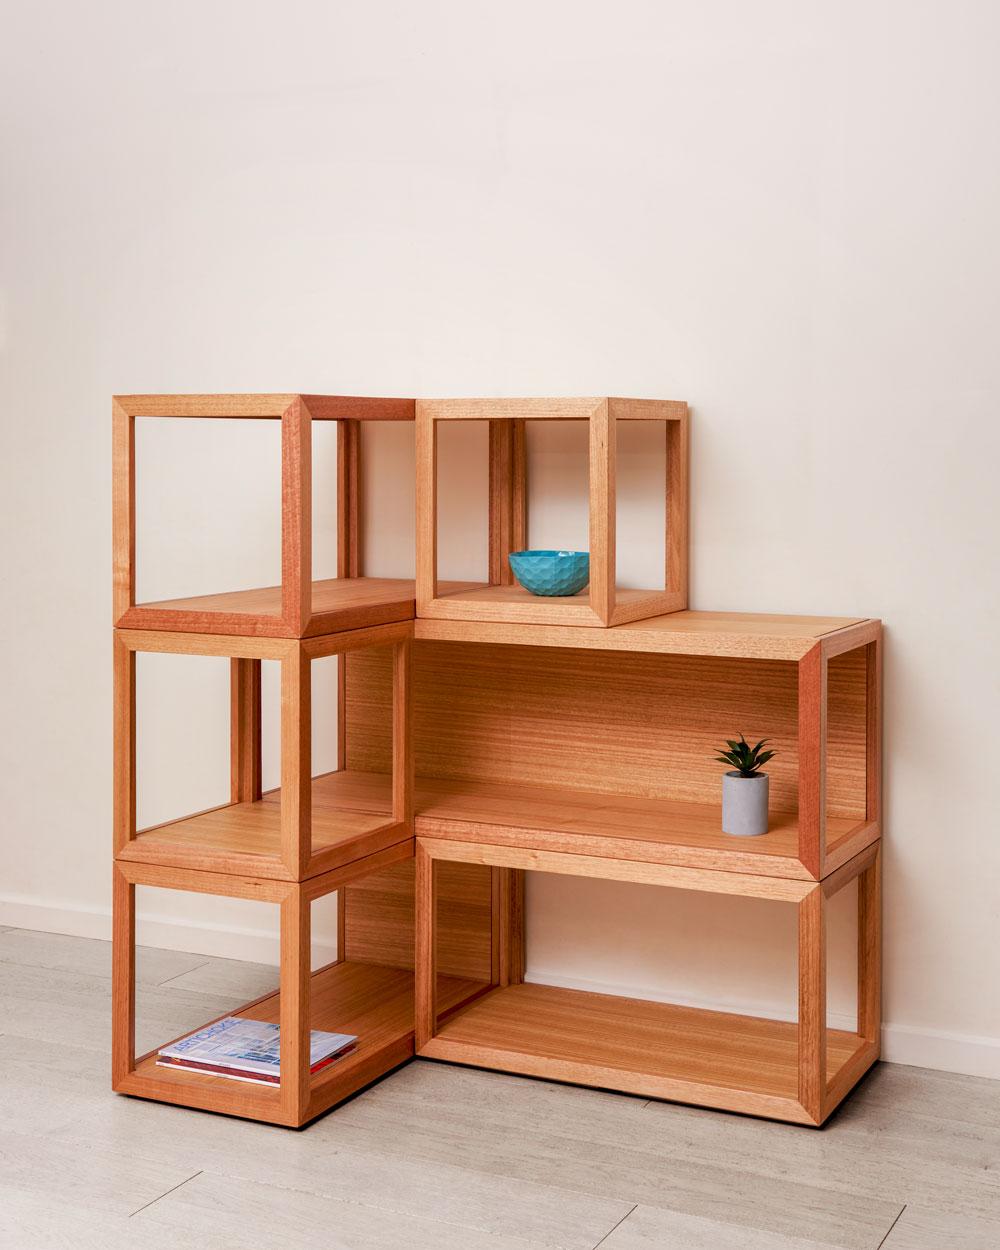 Cubis shelf system - corner arrangement - custom designed furniture - Geelong Melbourne Victoria